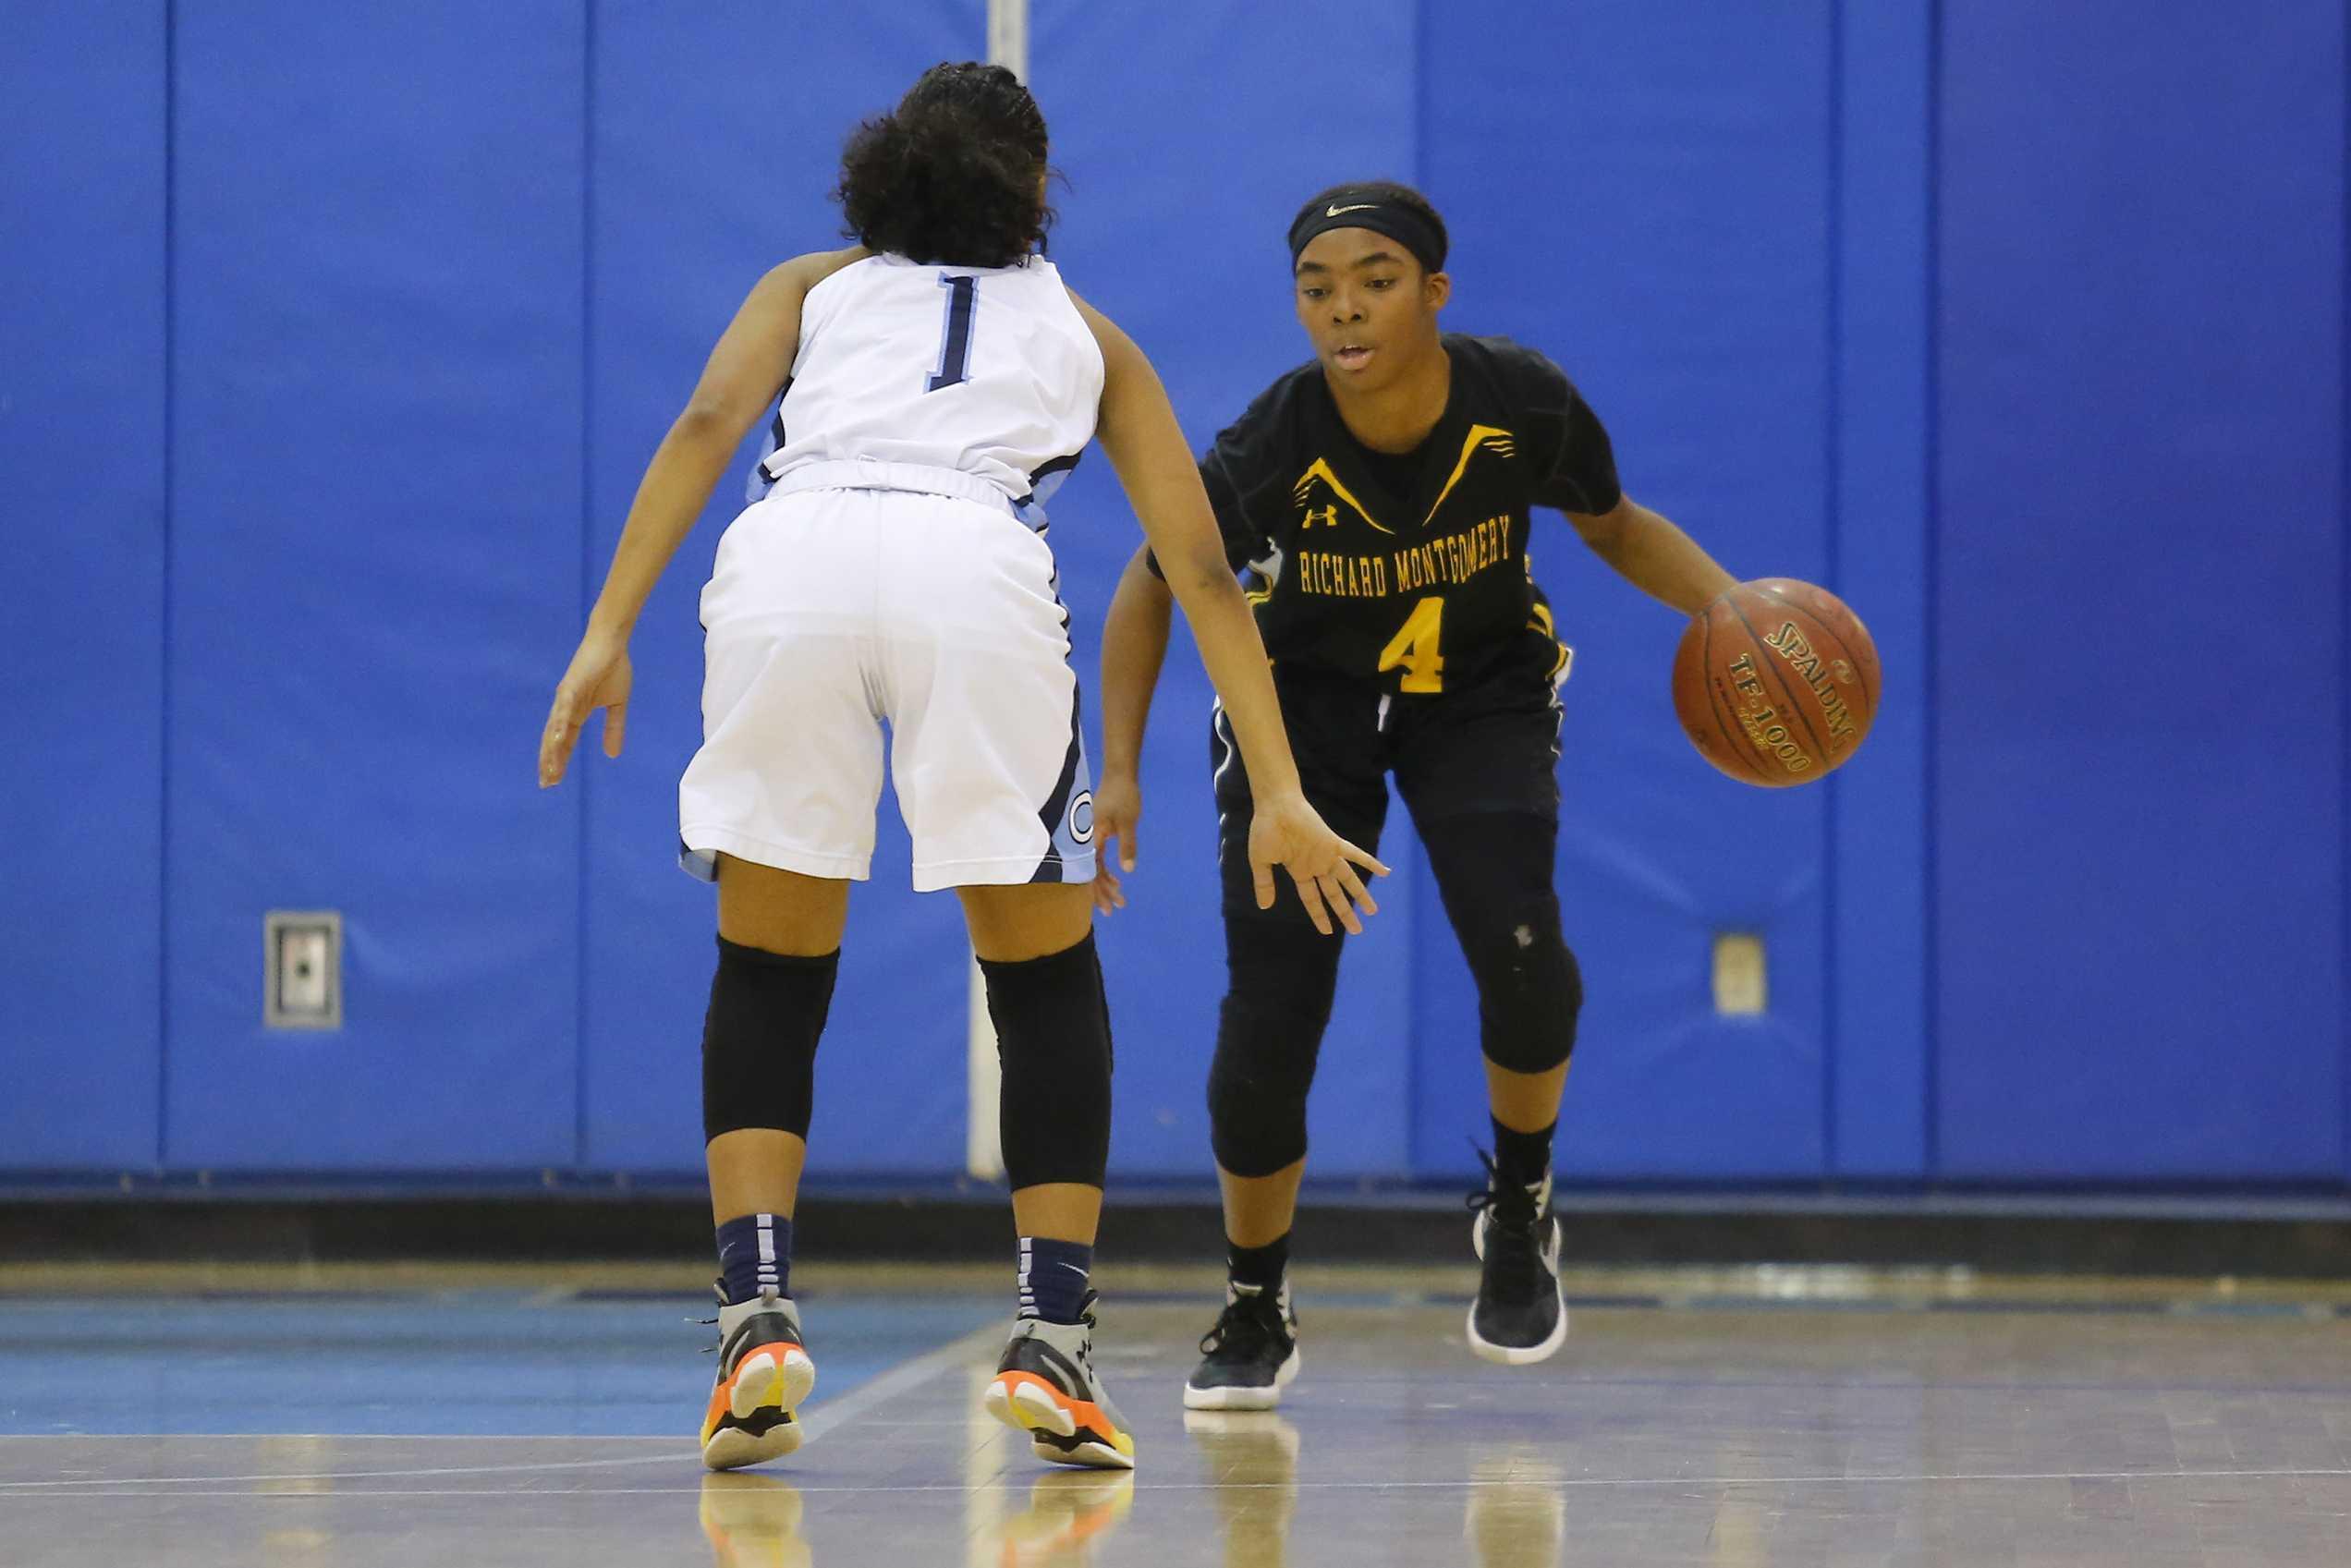 Girls basketball opens up season with narrow 56-51 win over Walter Johnson